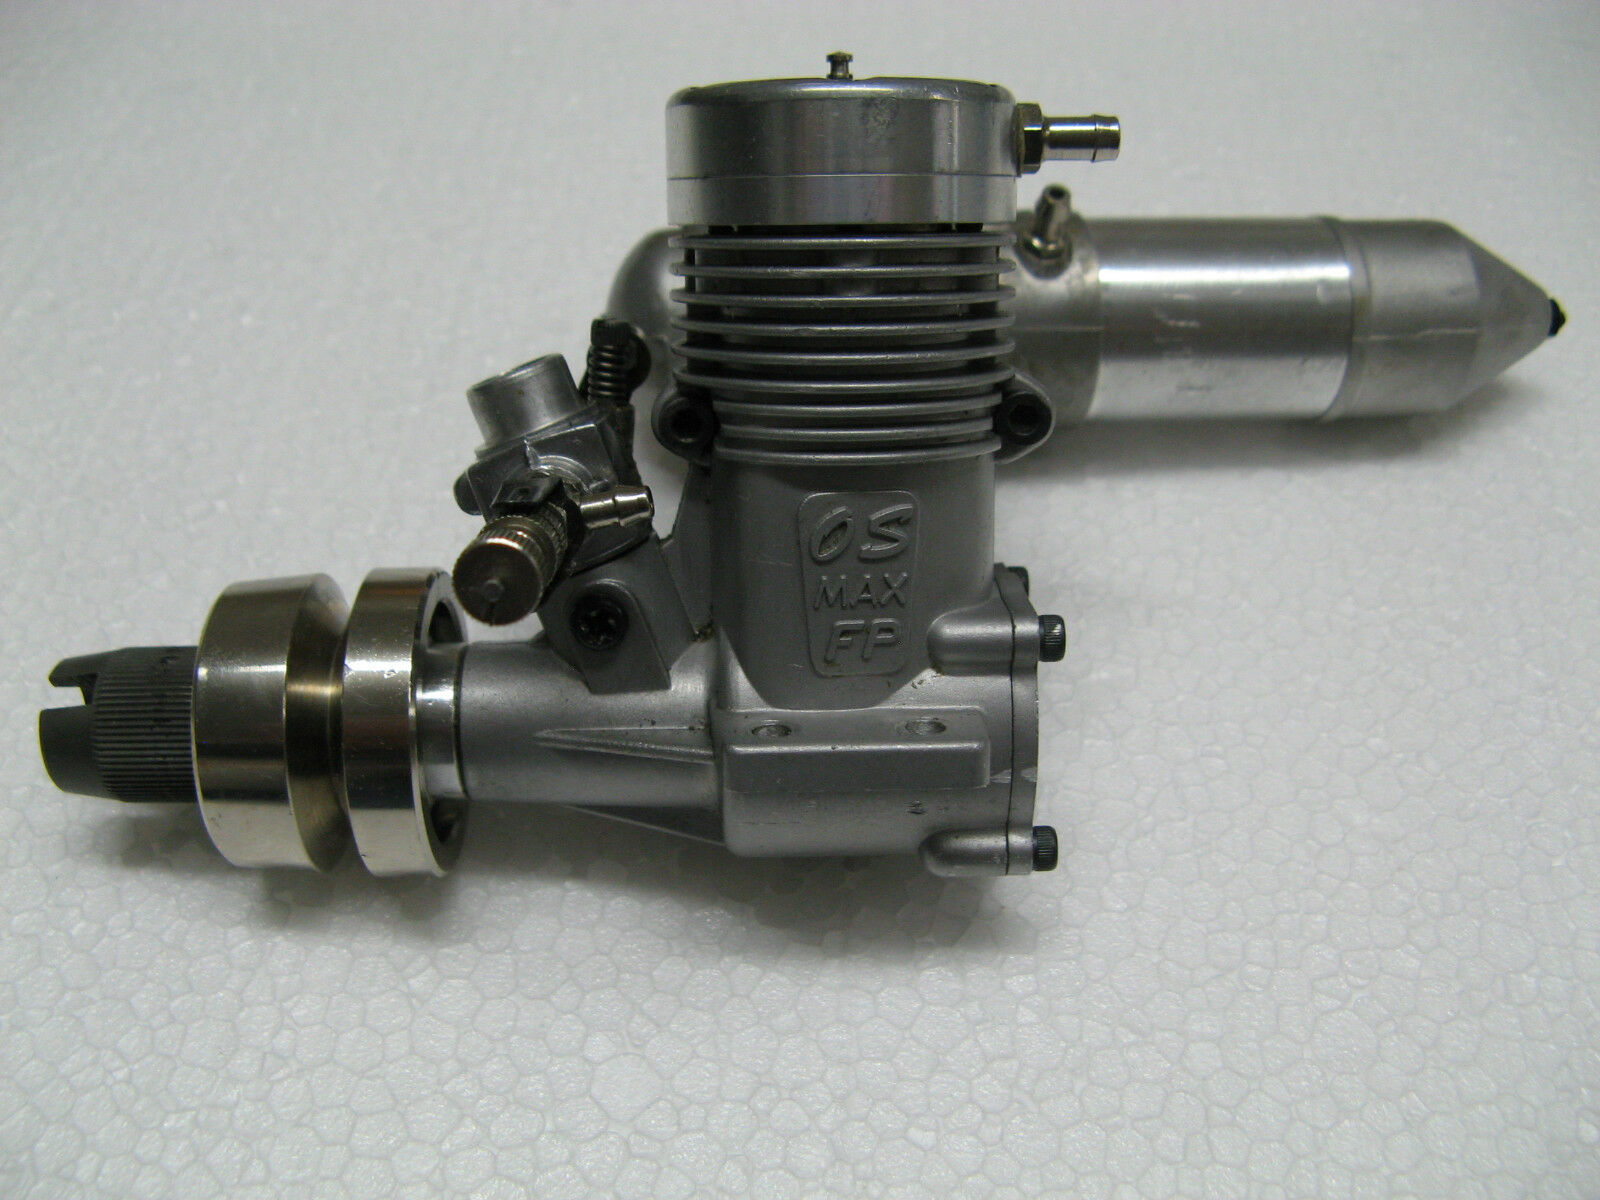 GRAUPNER: OS MAX 20 FP-M motore a combustione interna  1410 con silenziatore